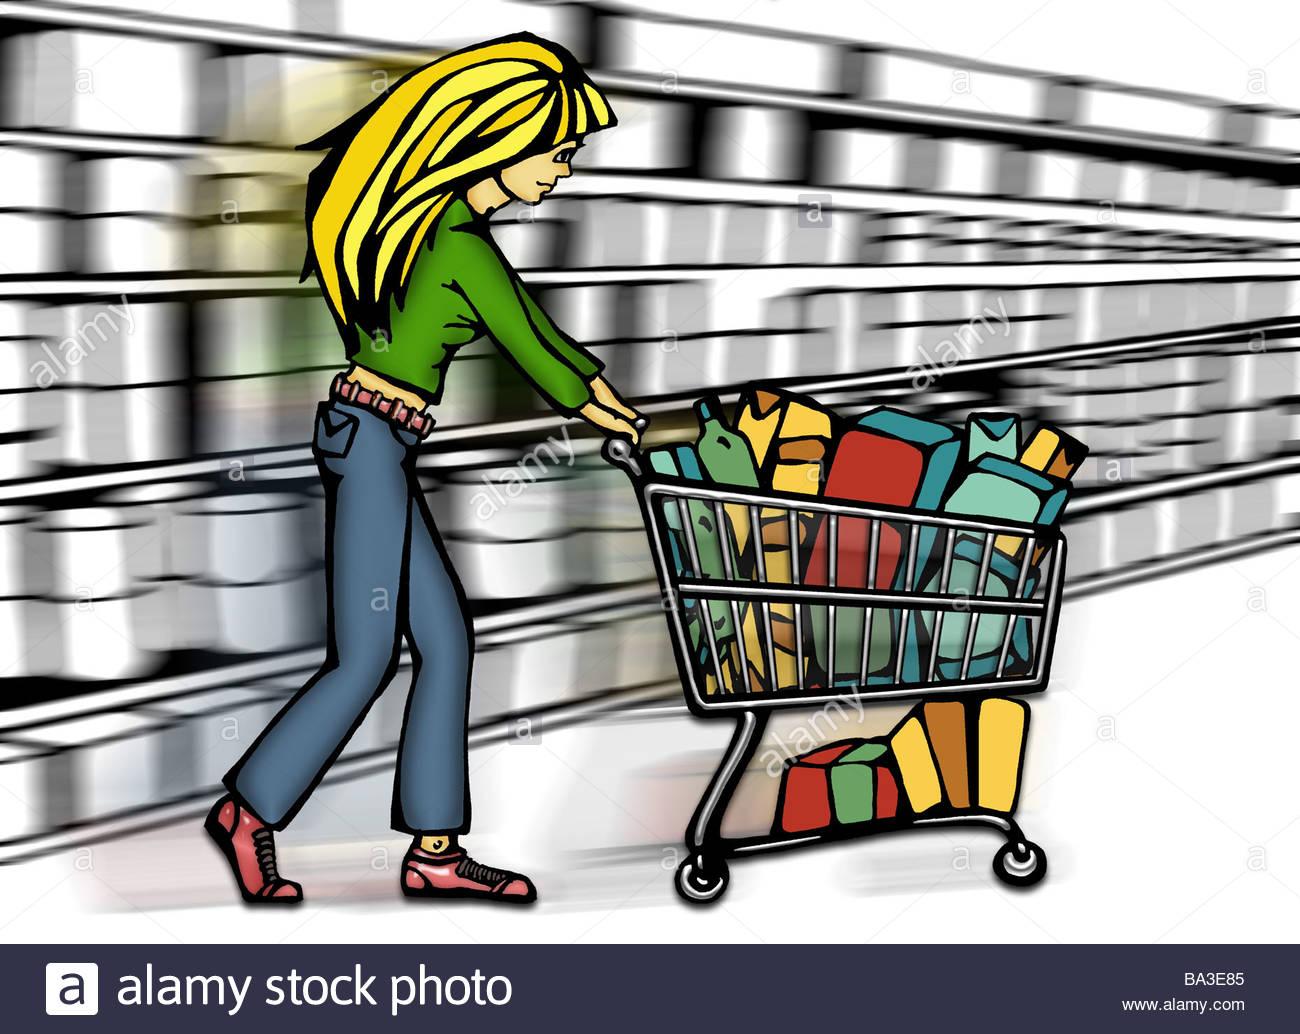 1300x1034 Illustration Manga Supermarket Woman Young Blond Shopping Carts